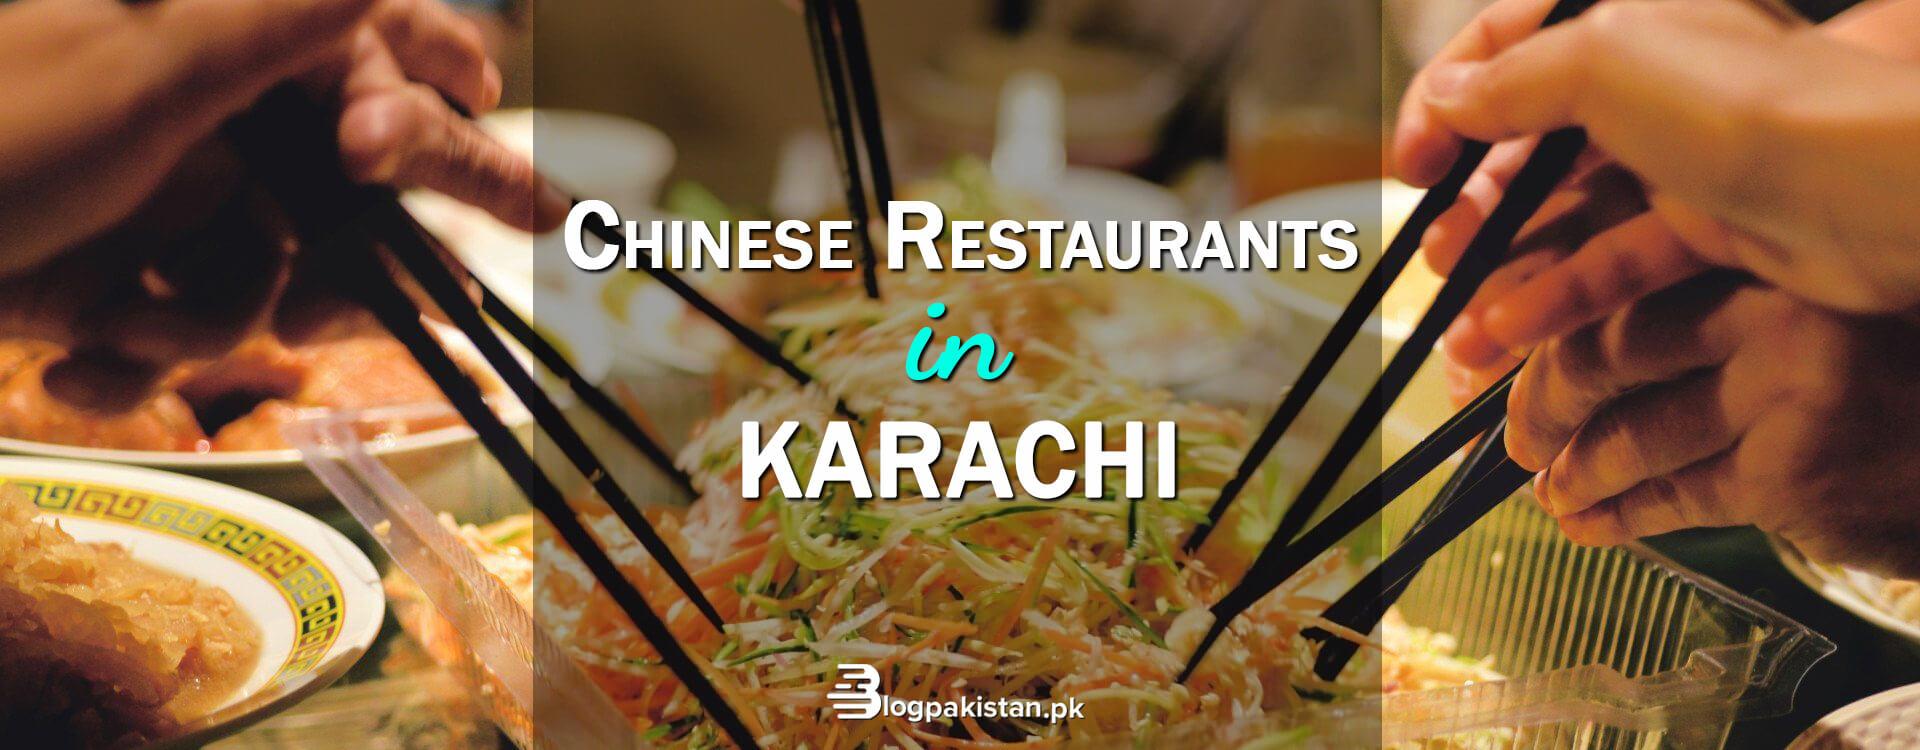 Chinese Restaurants in Karachi